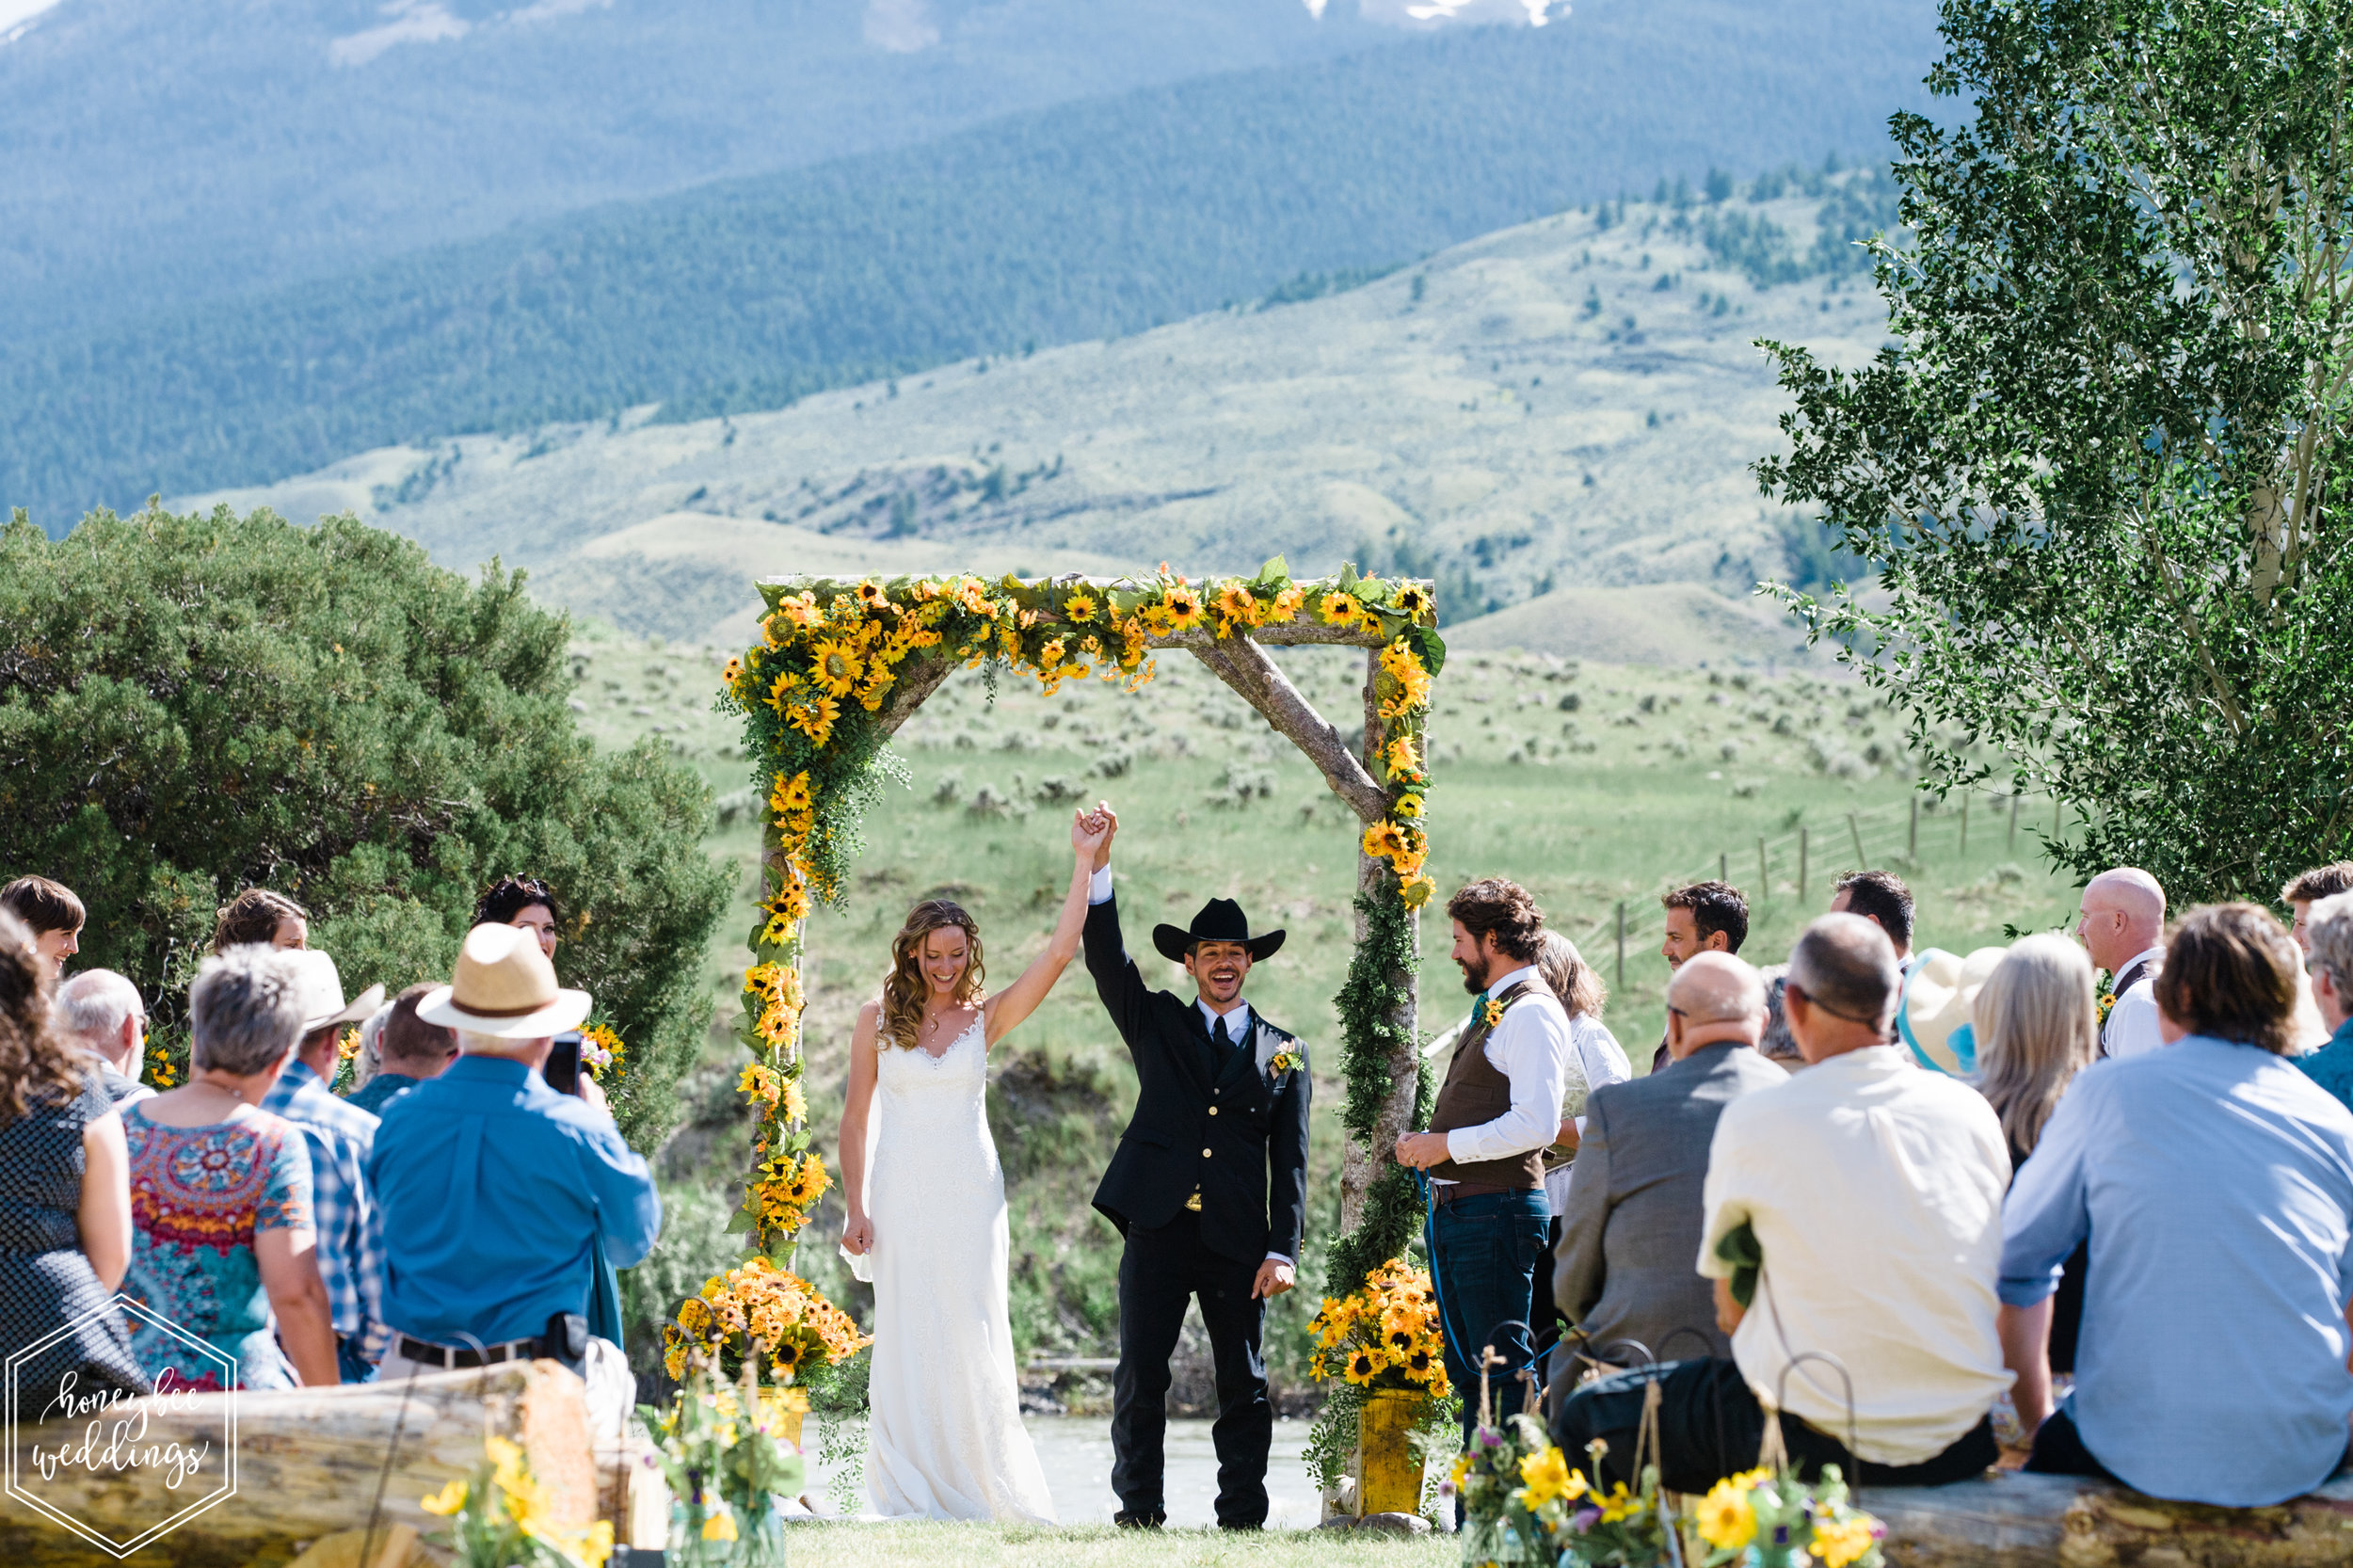 068Yellowstone National Park Wedding_Montana Wedding Photographer_Honeybee Weddings_Shannon & Jonathan_June 29, 2019-1612.jpg